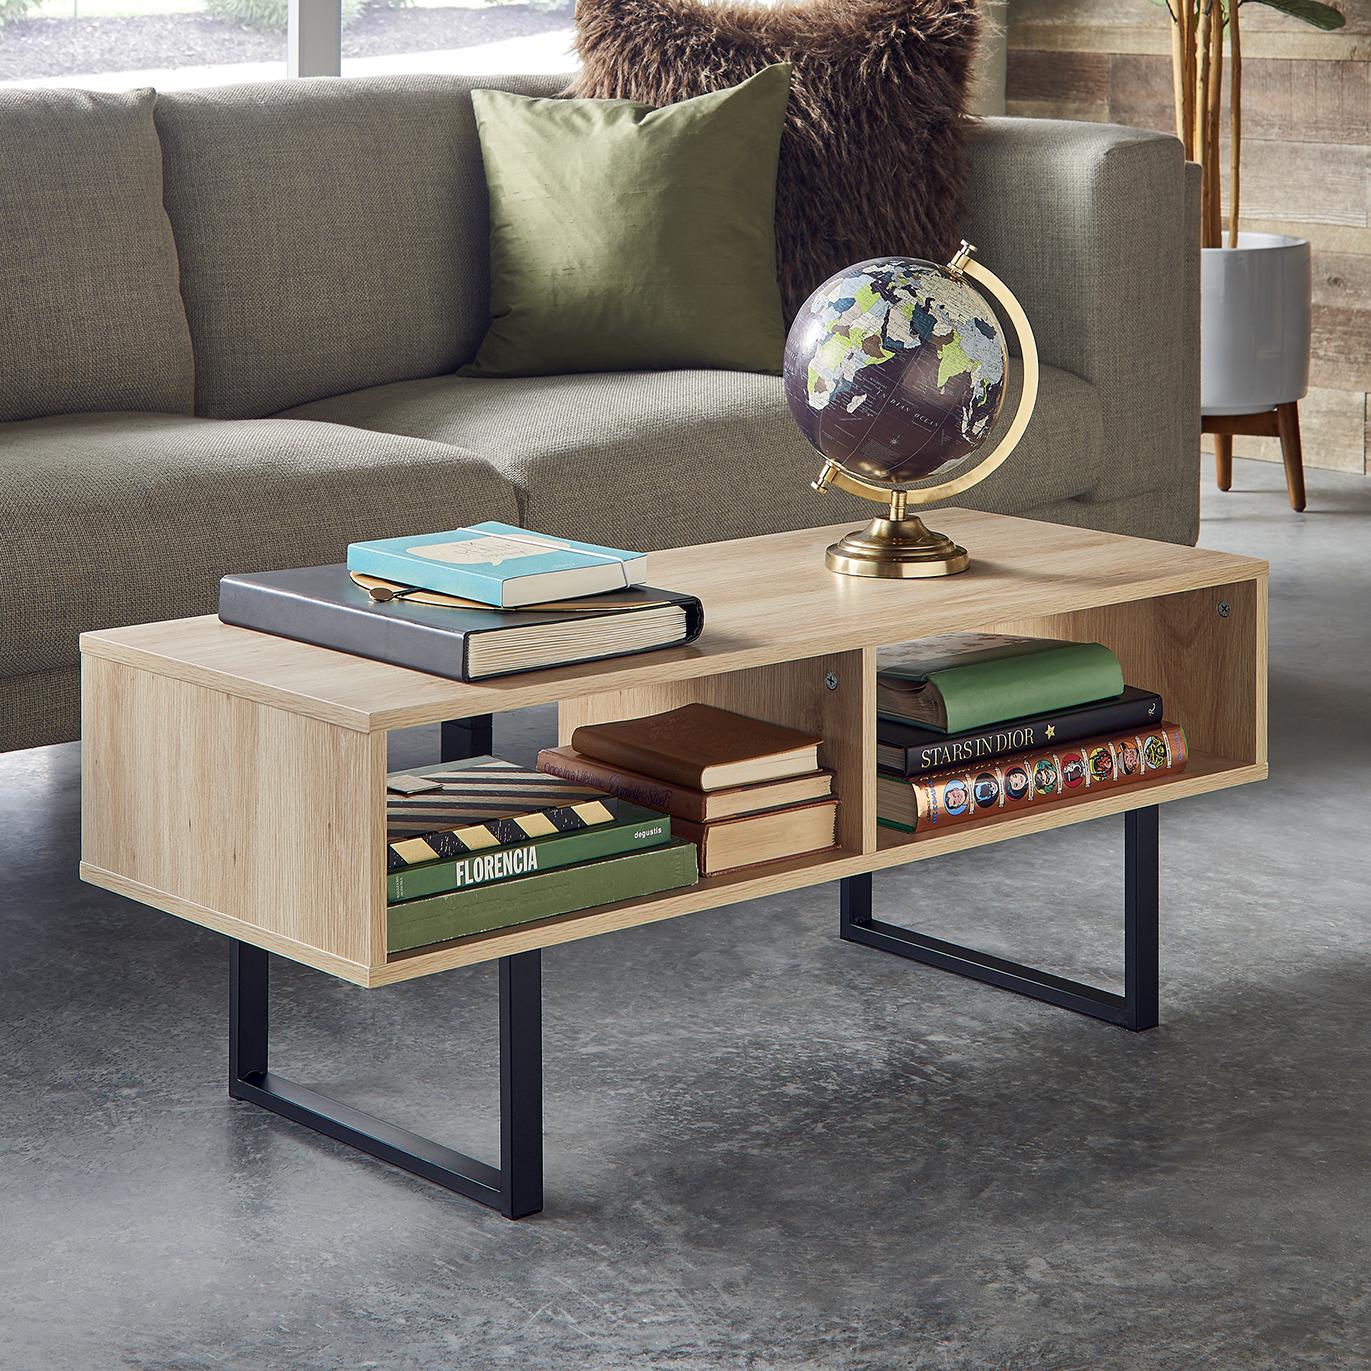 Storage Furniture Coffee Table White Closetmaid: Amazon.com: ClosetMaid 1315 Rectangular Wood Coffee Table